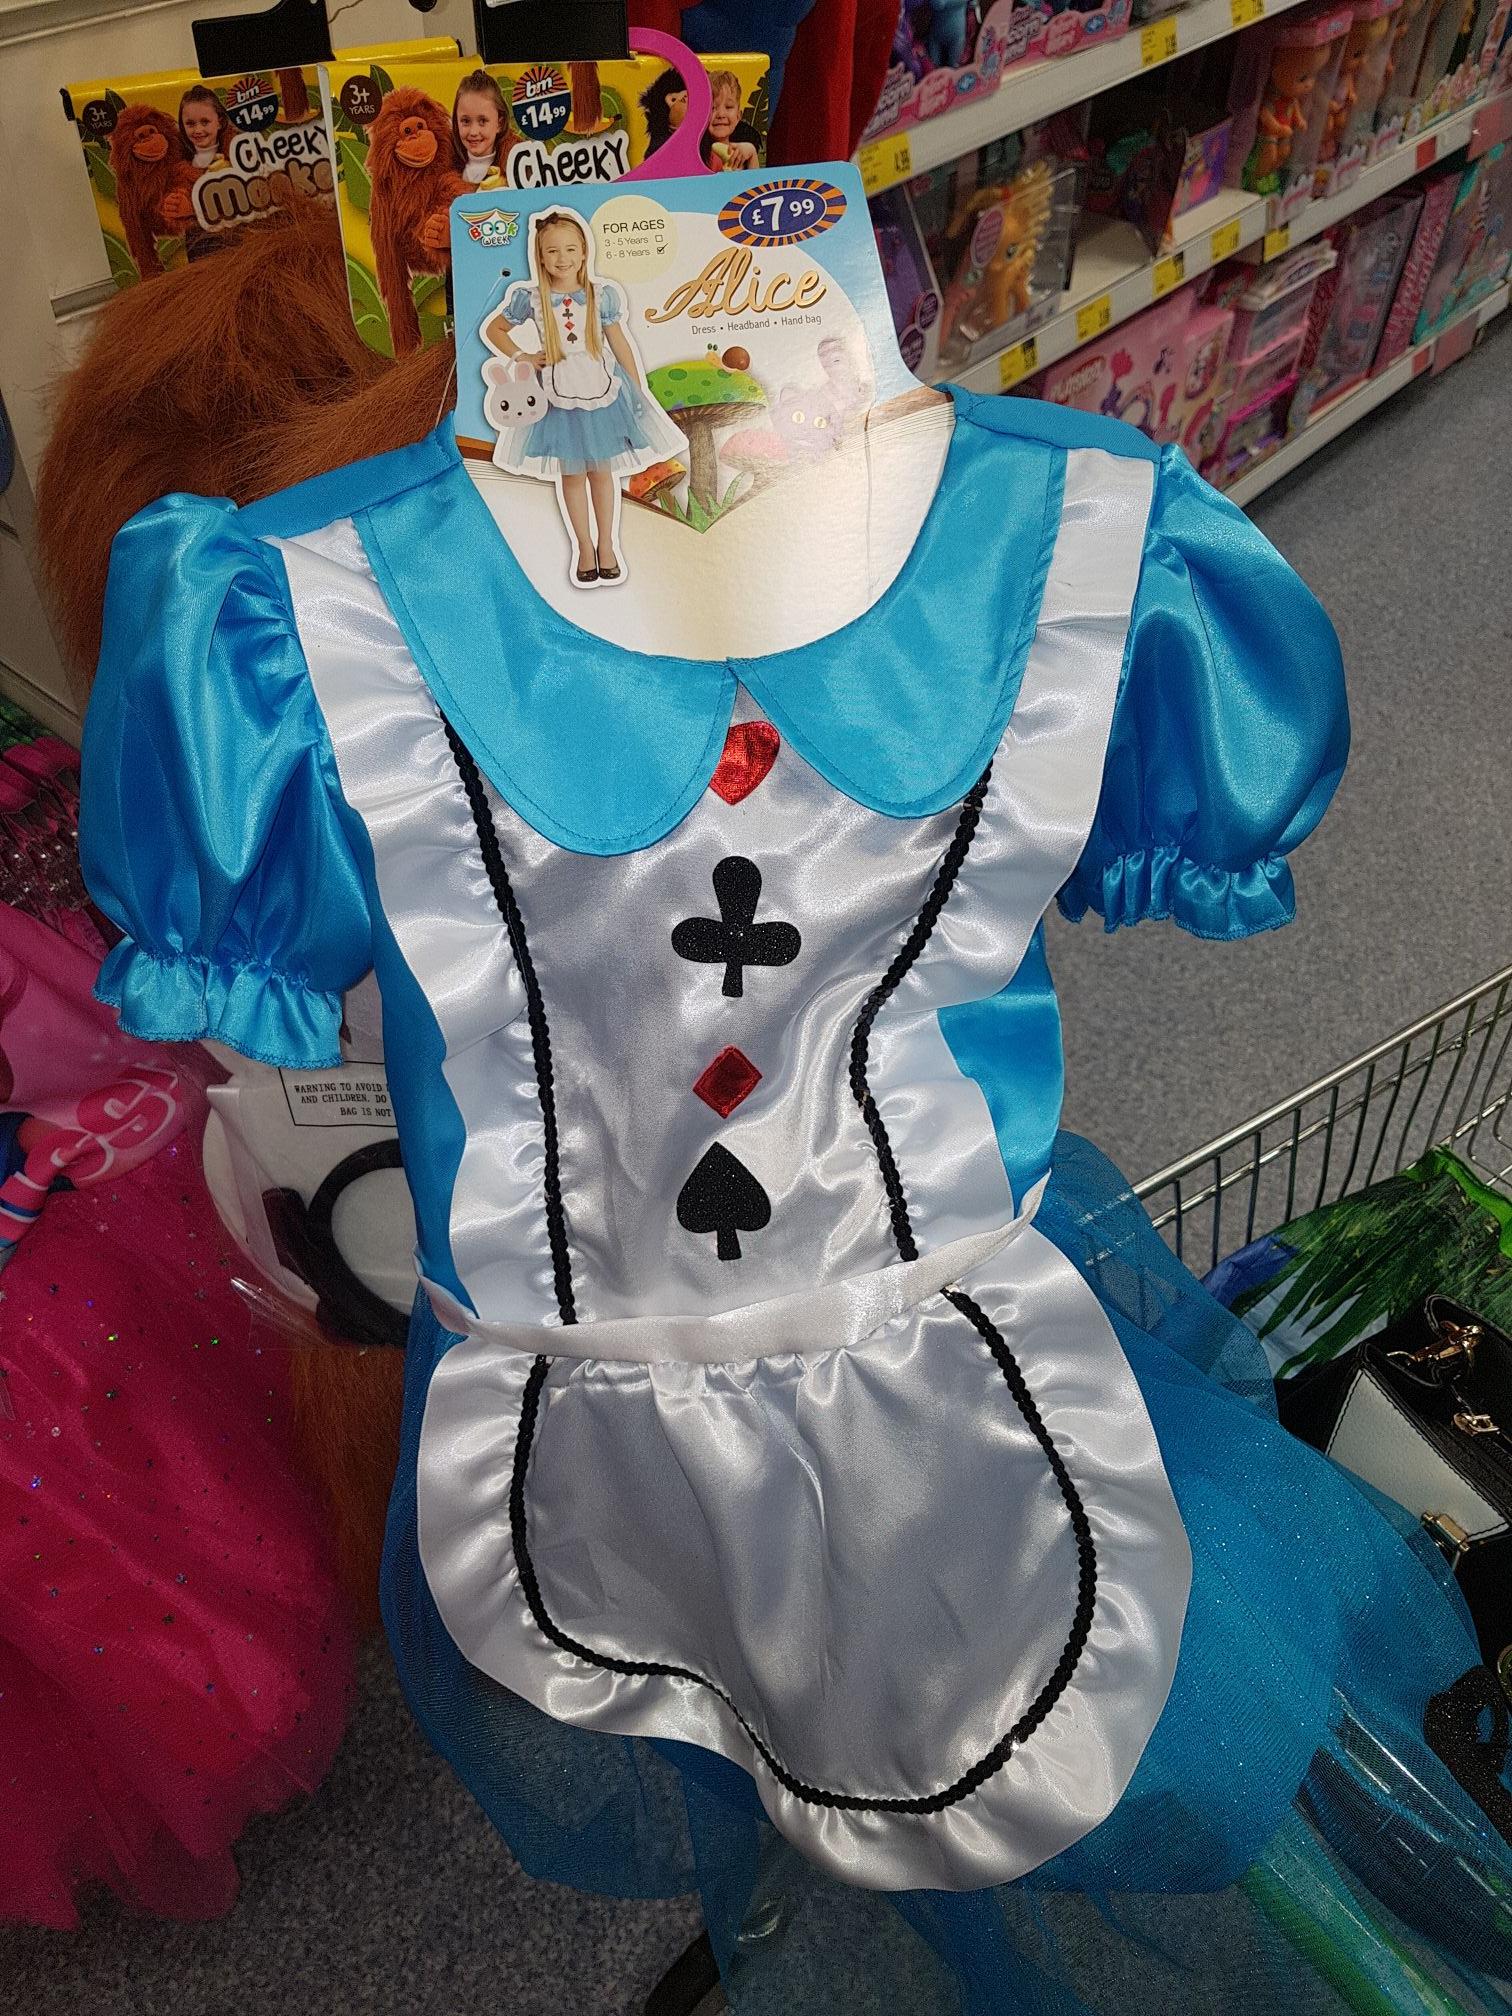 Alice in wonderland kids costume - £1 @ B&M